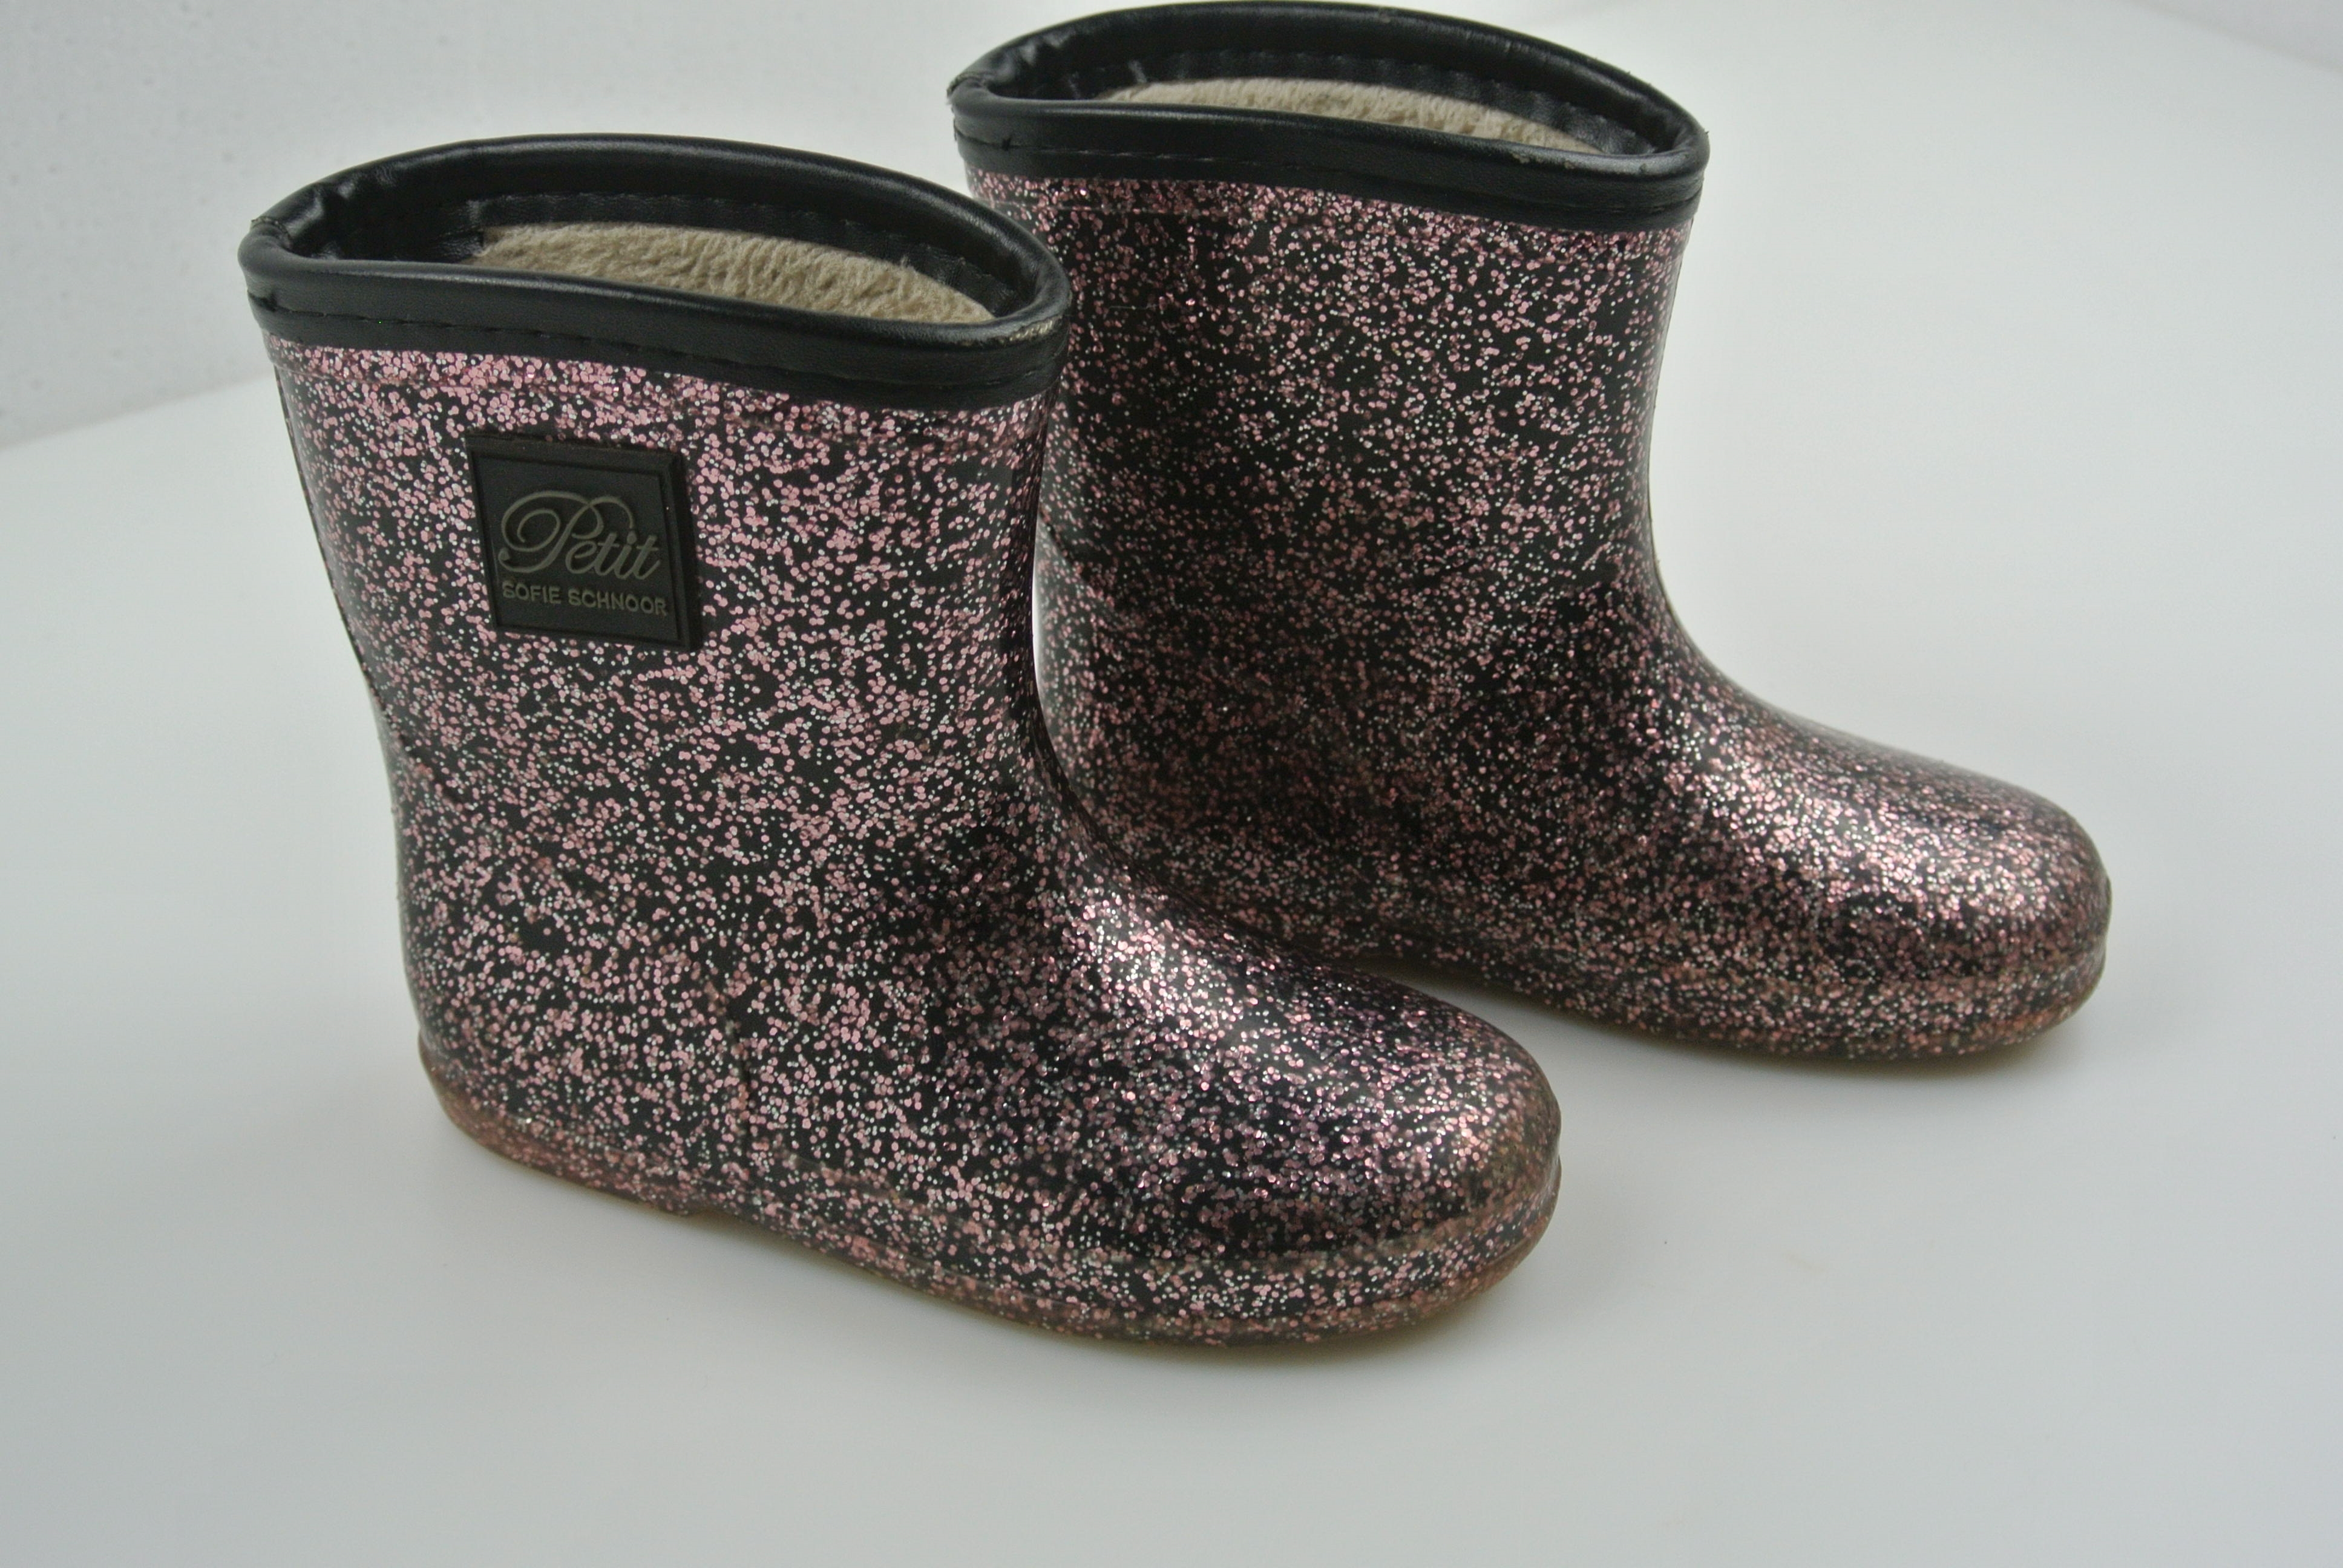 Petit by Sofie schnoor gummistøvler str 25 sko